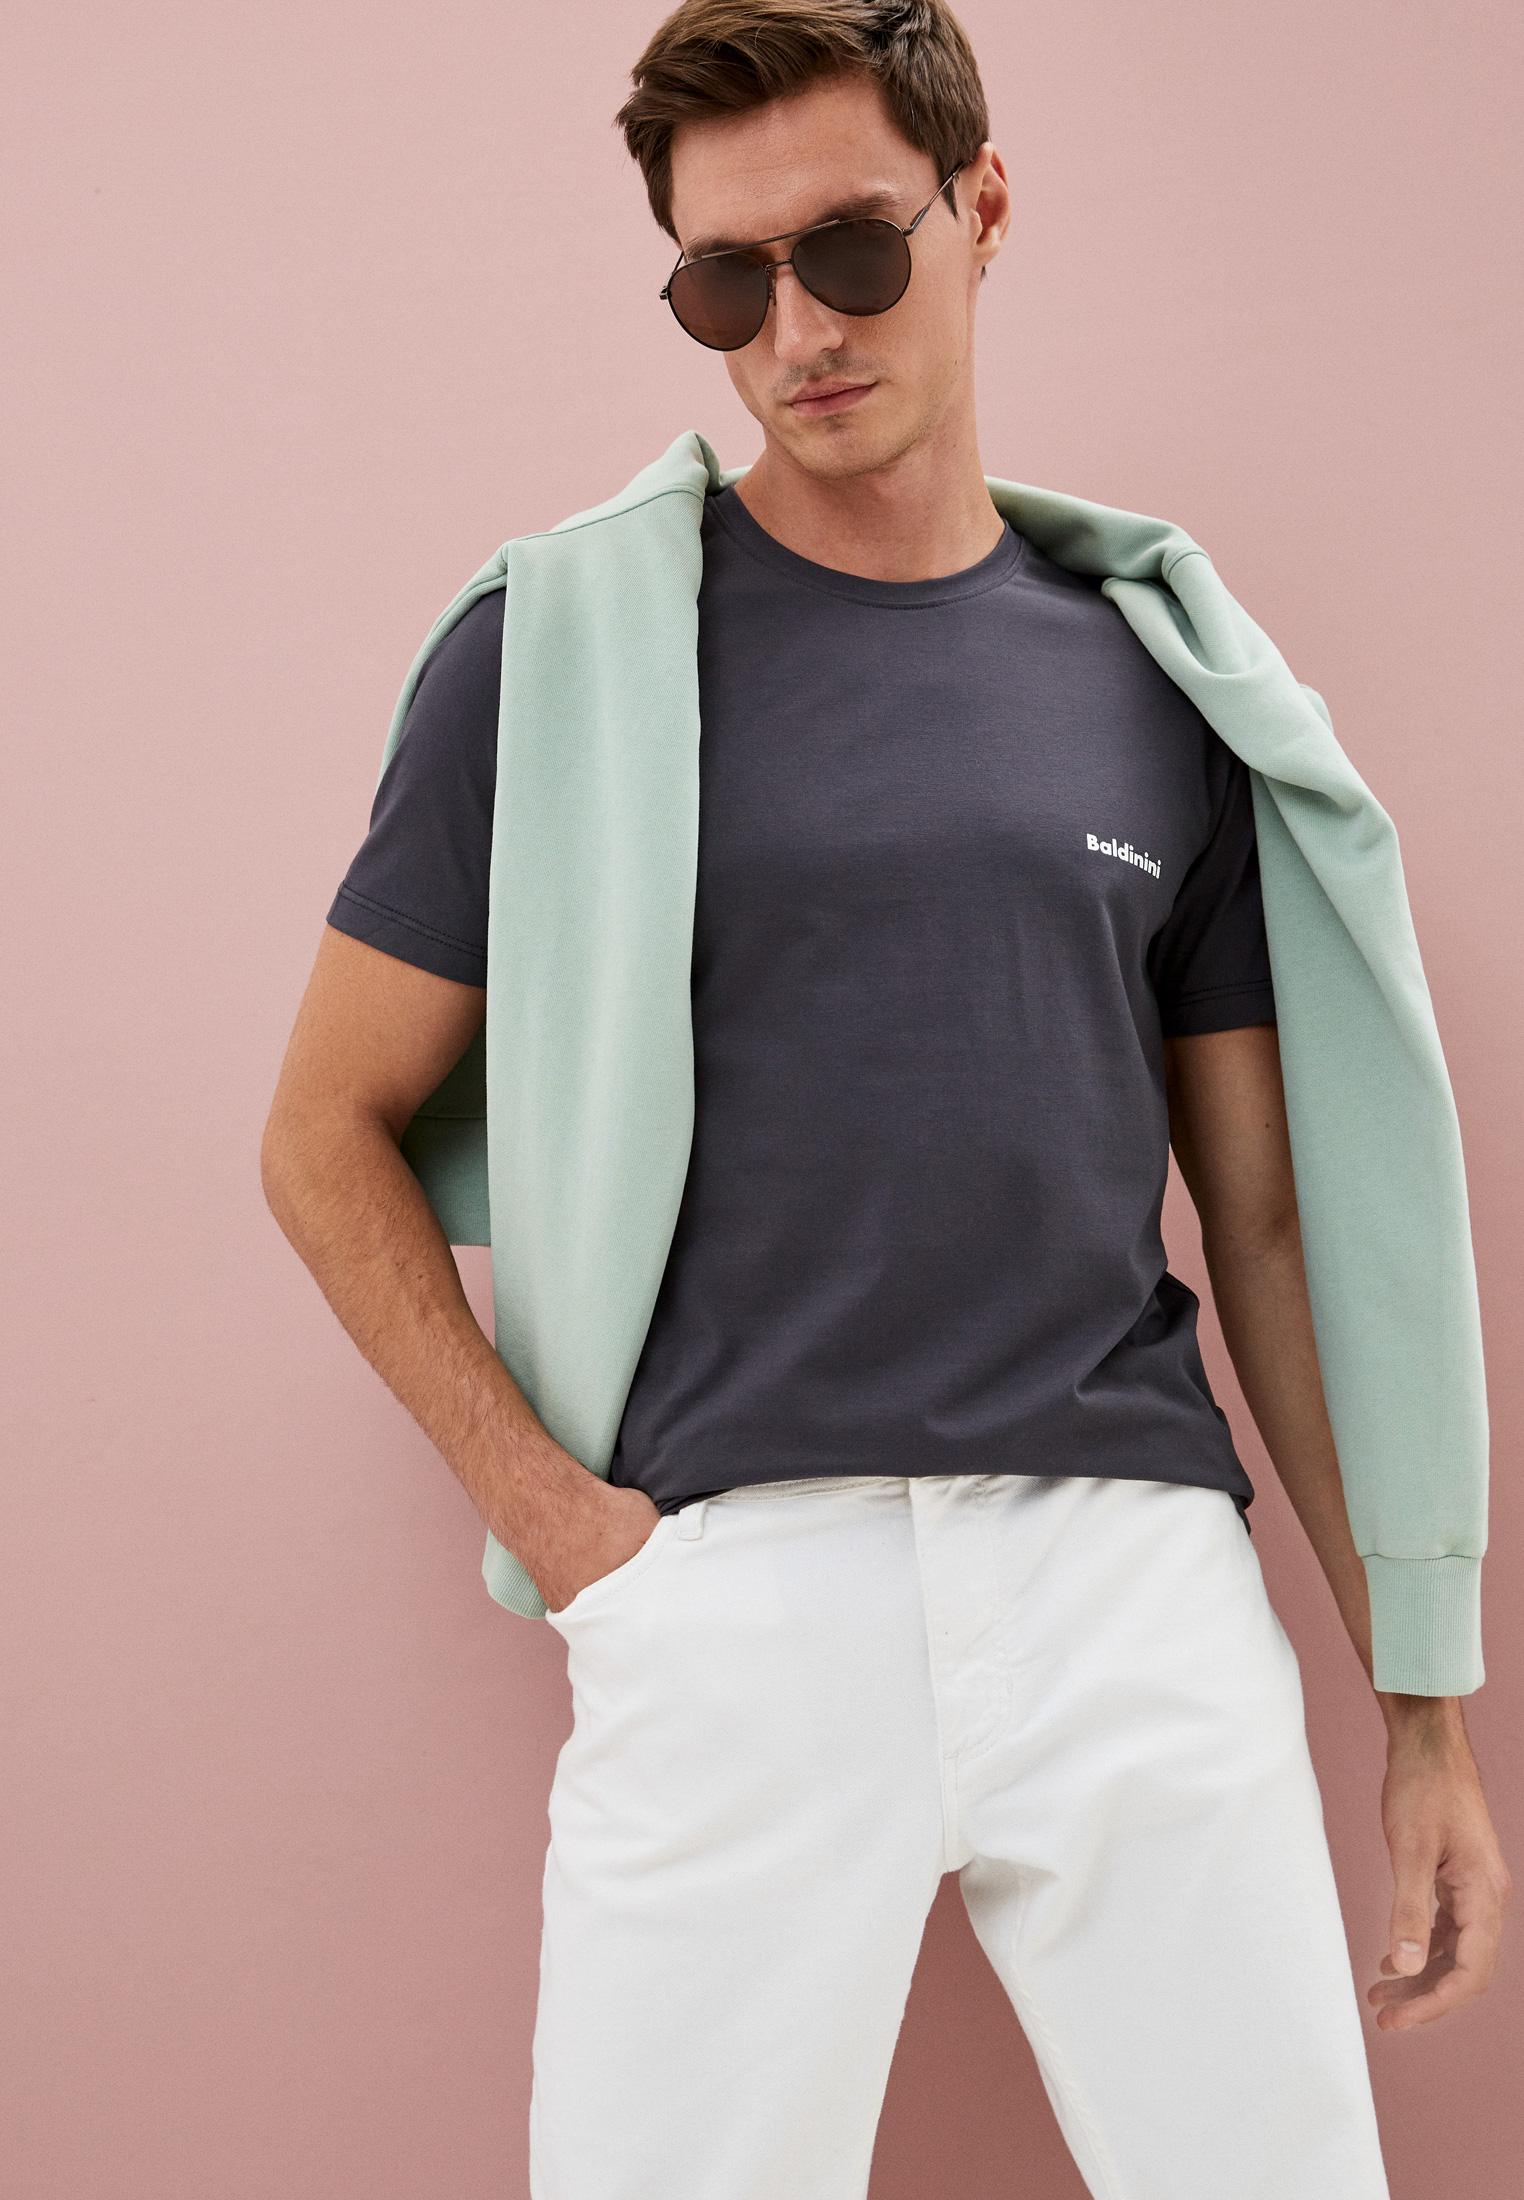 Мужская футболка Baldinini (Балдинини) TSU00: изображение 2